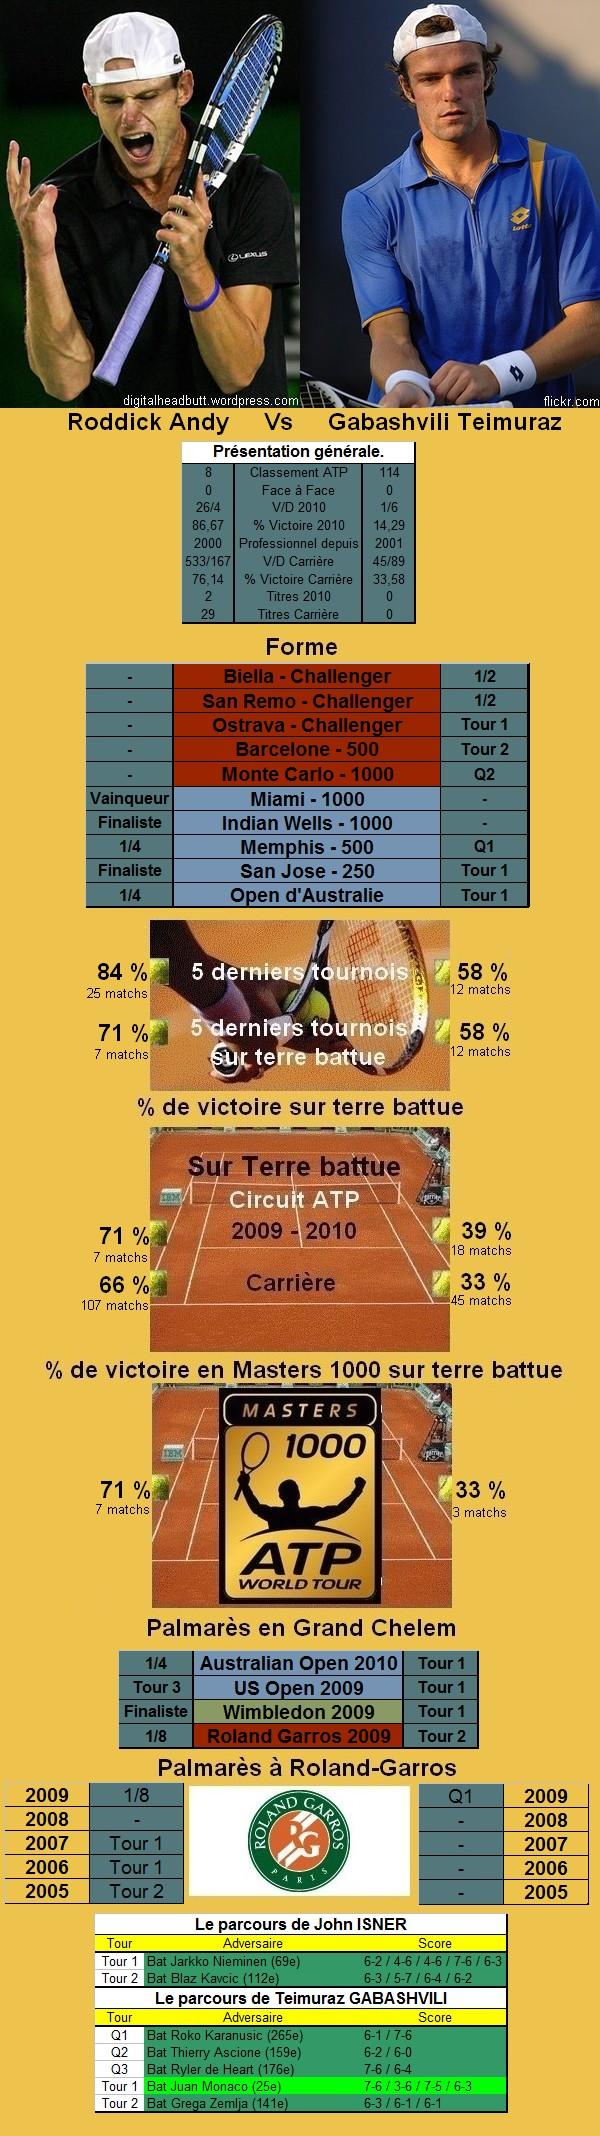 Statistiques tennis de Roddick contre Gabashvili à Roland Garros